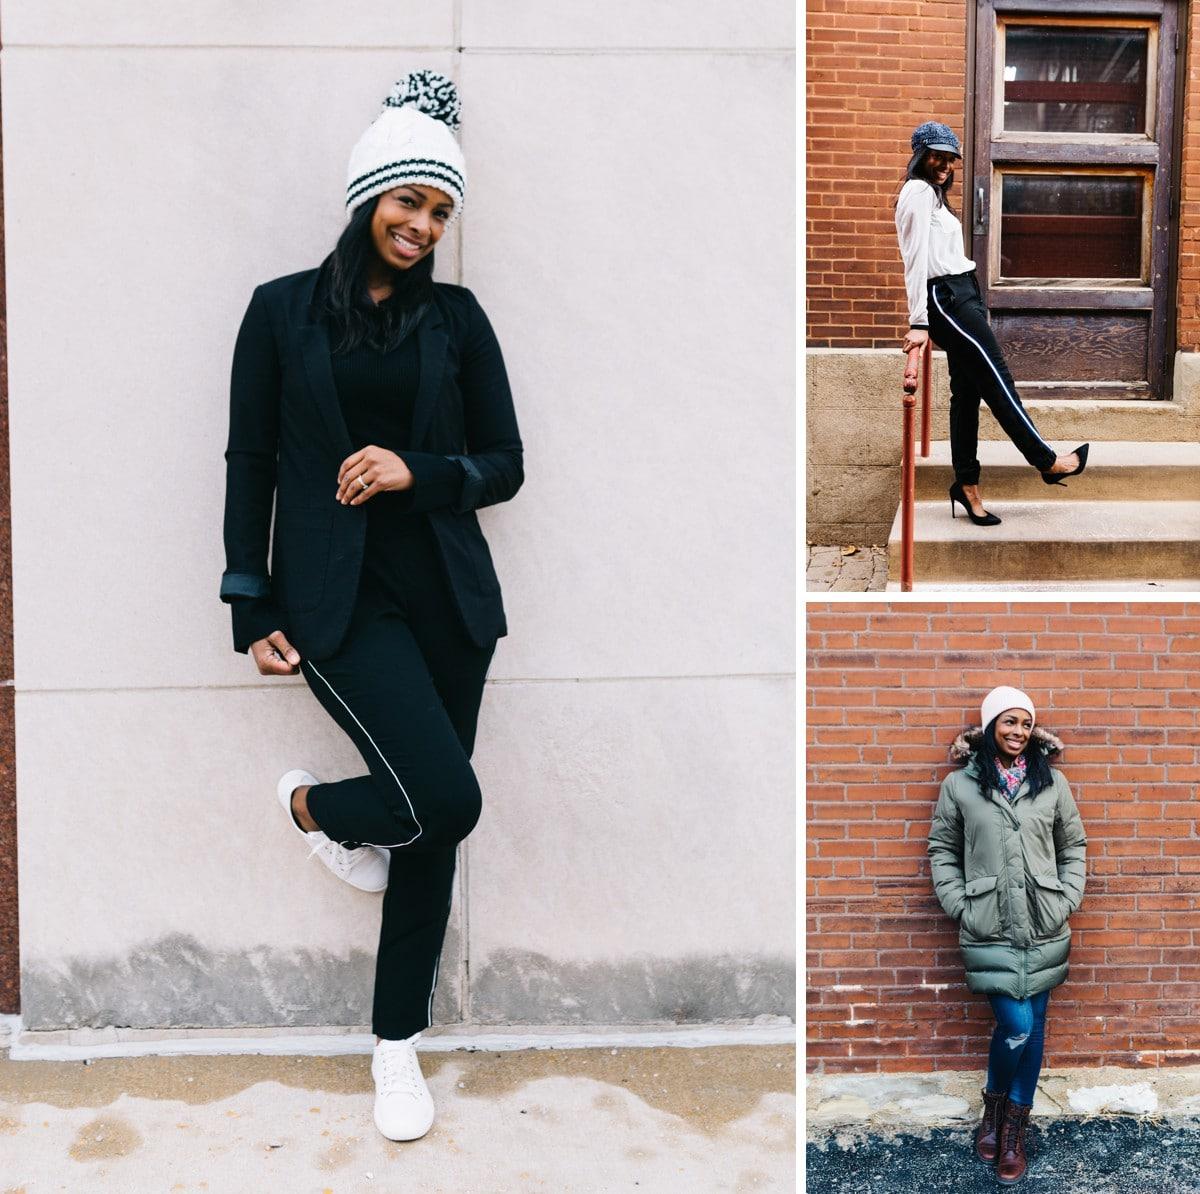 St. Louis Fashion Photographer